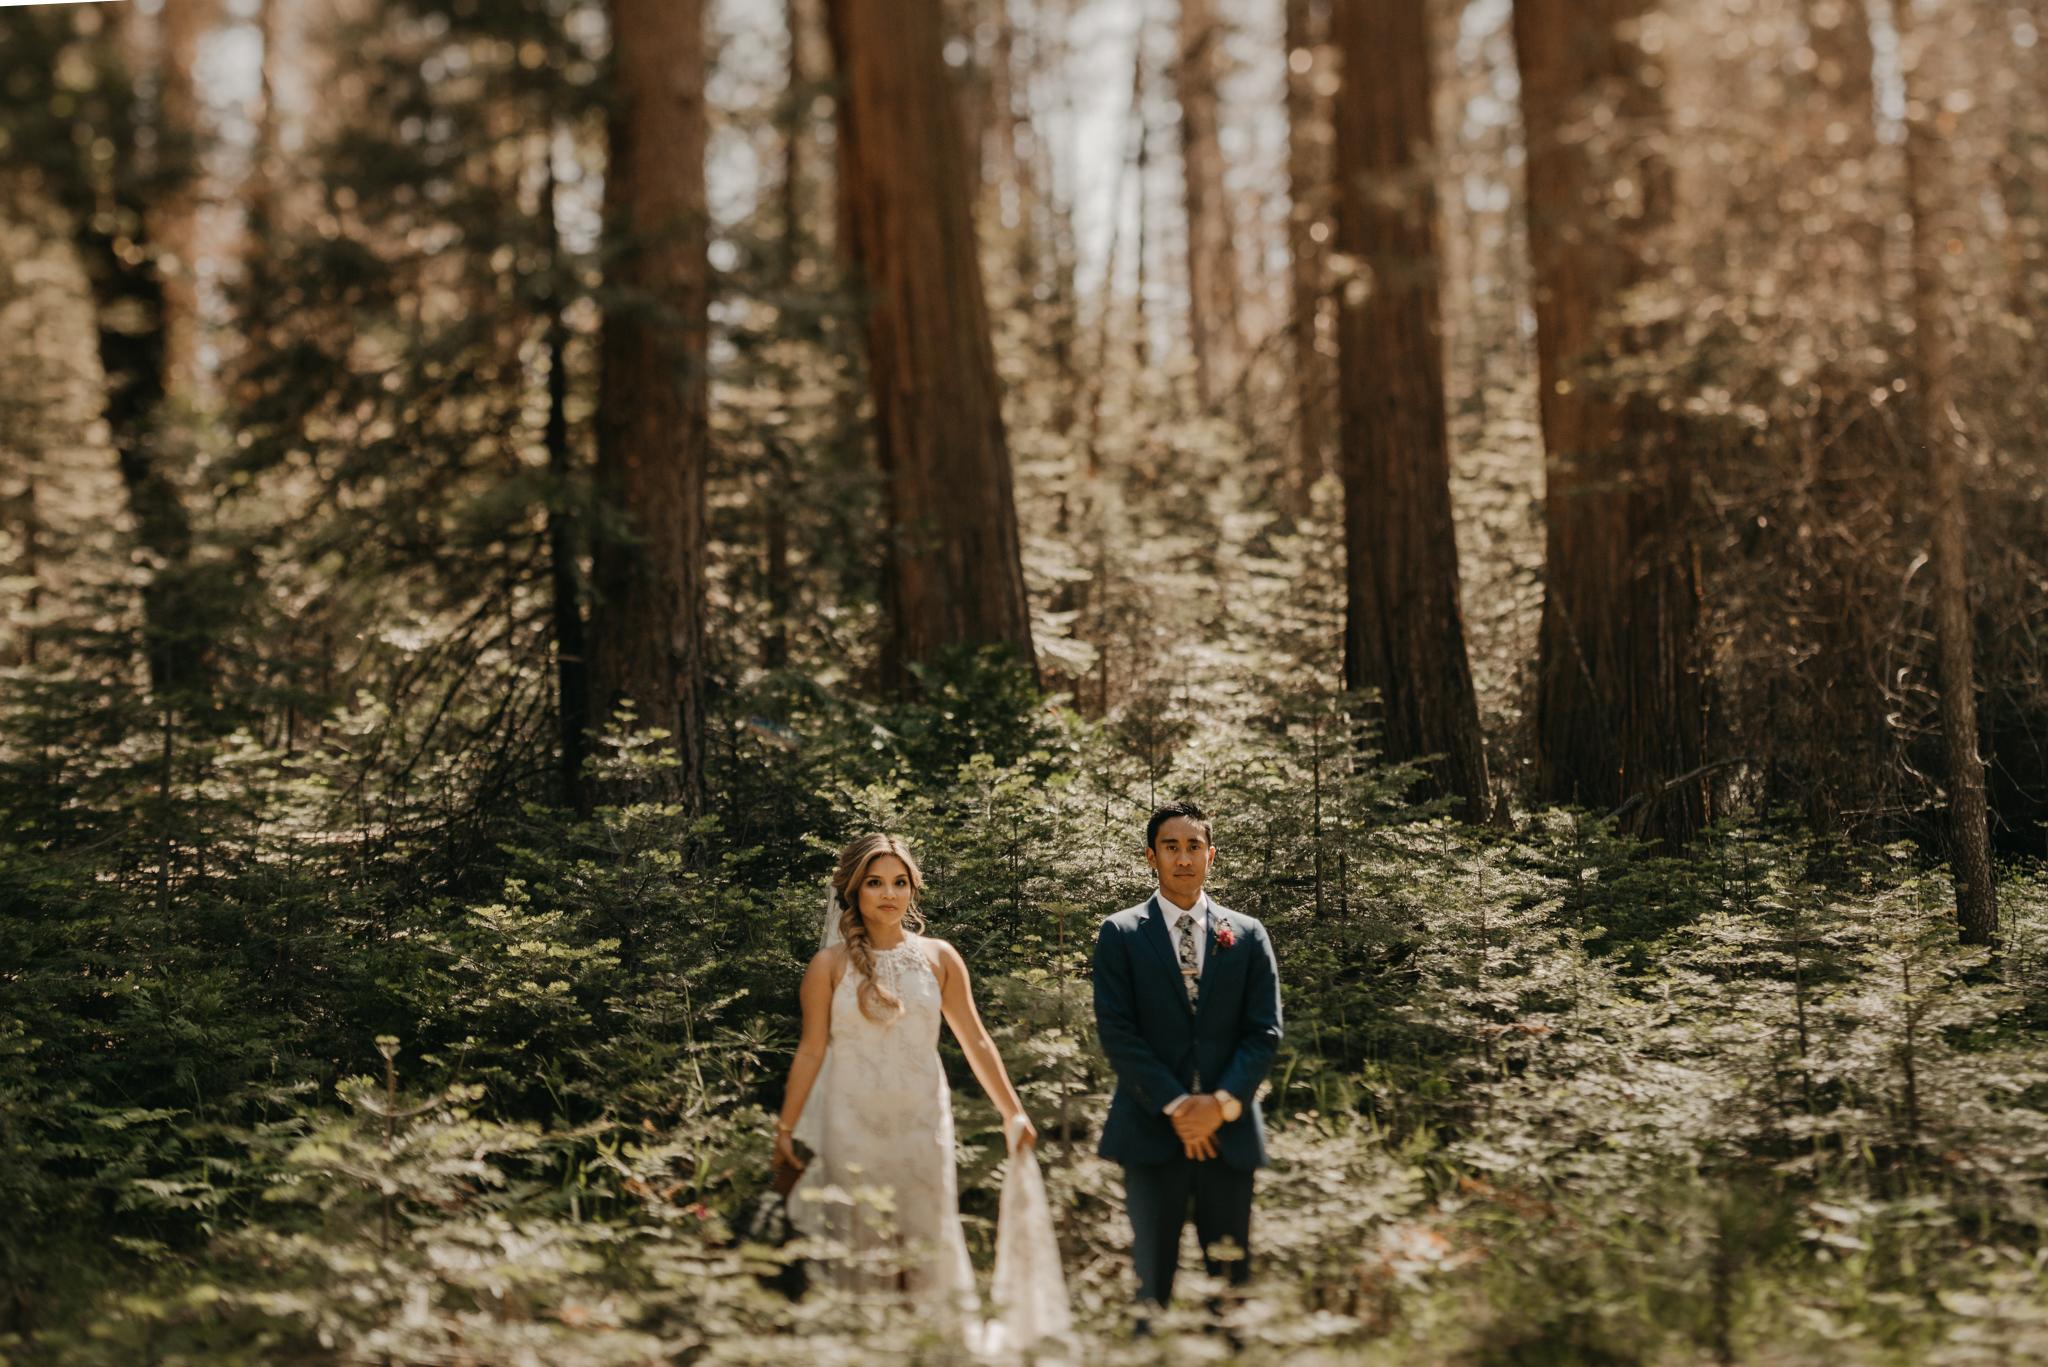 © Isaiah + Taylor Photography - Evergreen Lodge Destination Yoesmite Wedding - Los Angeles Wedding Photographer-134.jpg